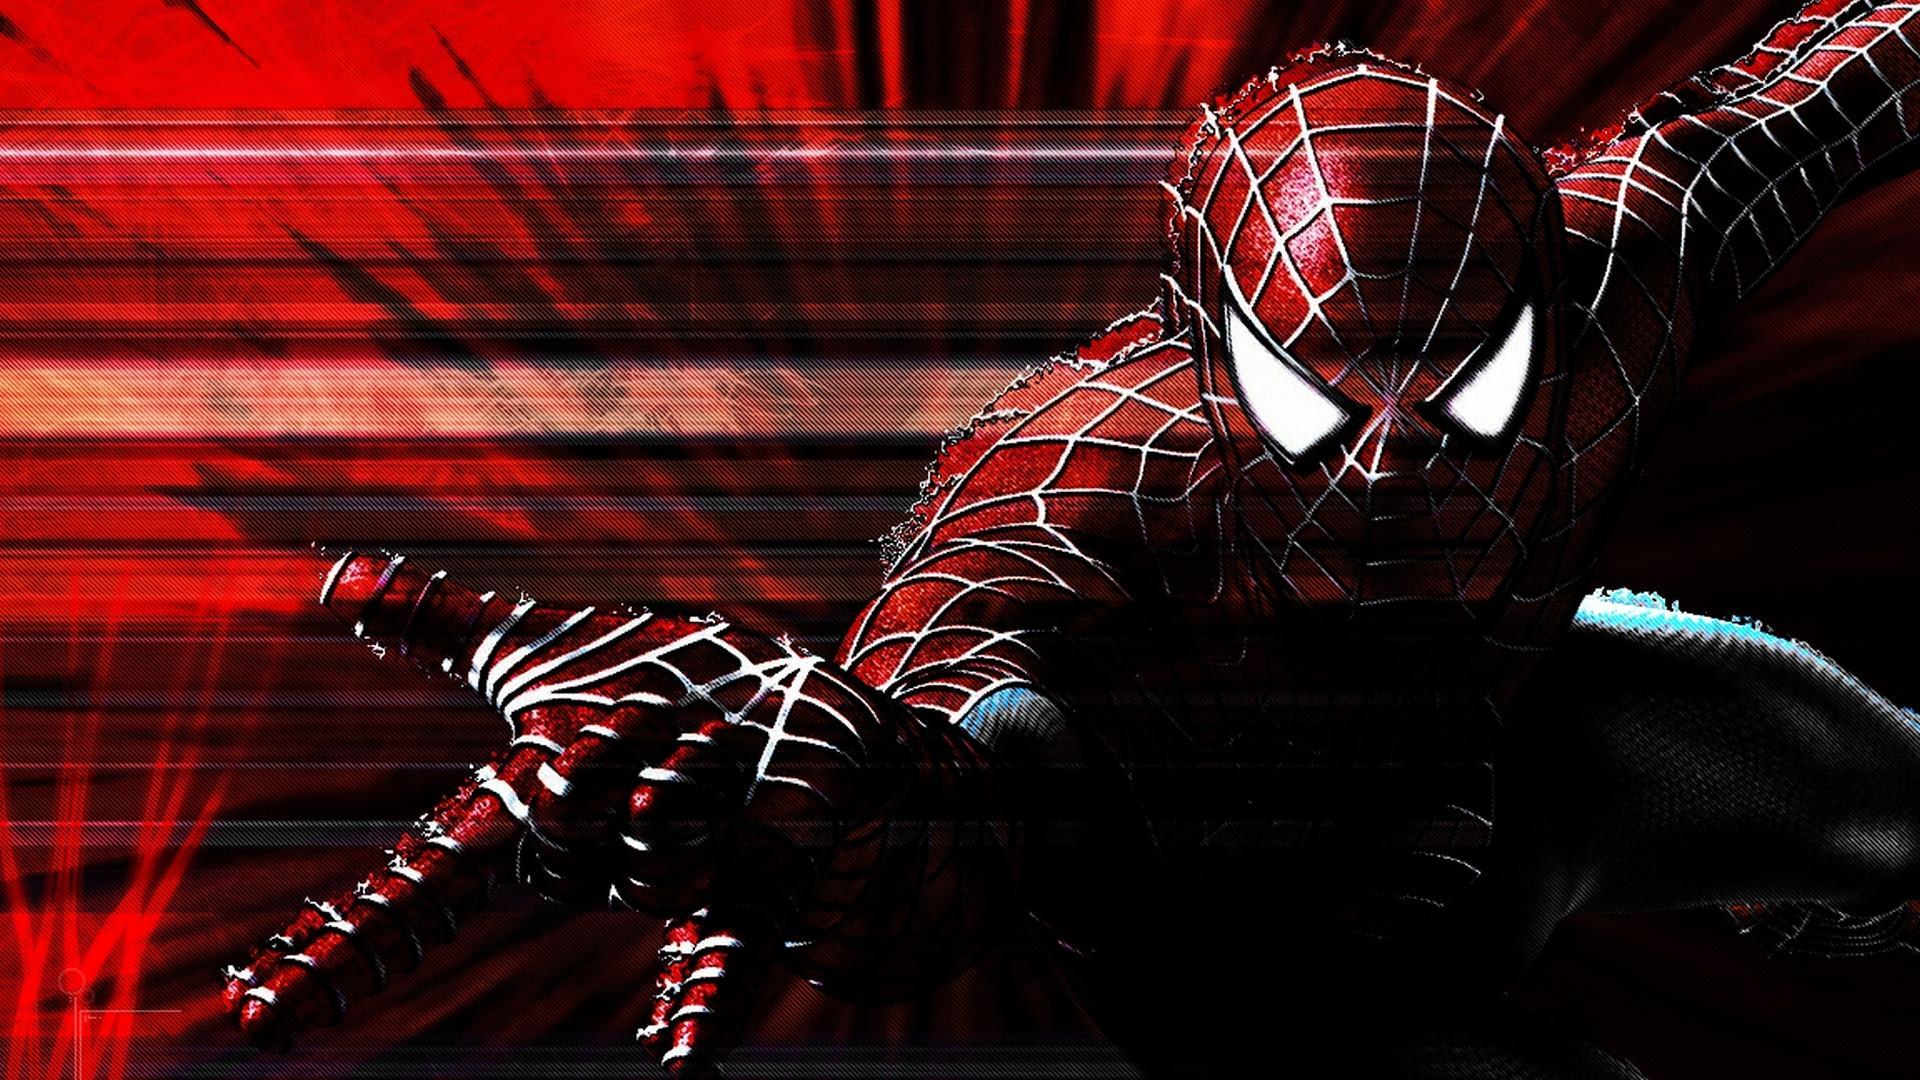 Spiderman web background blue